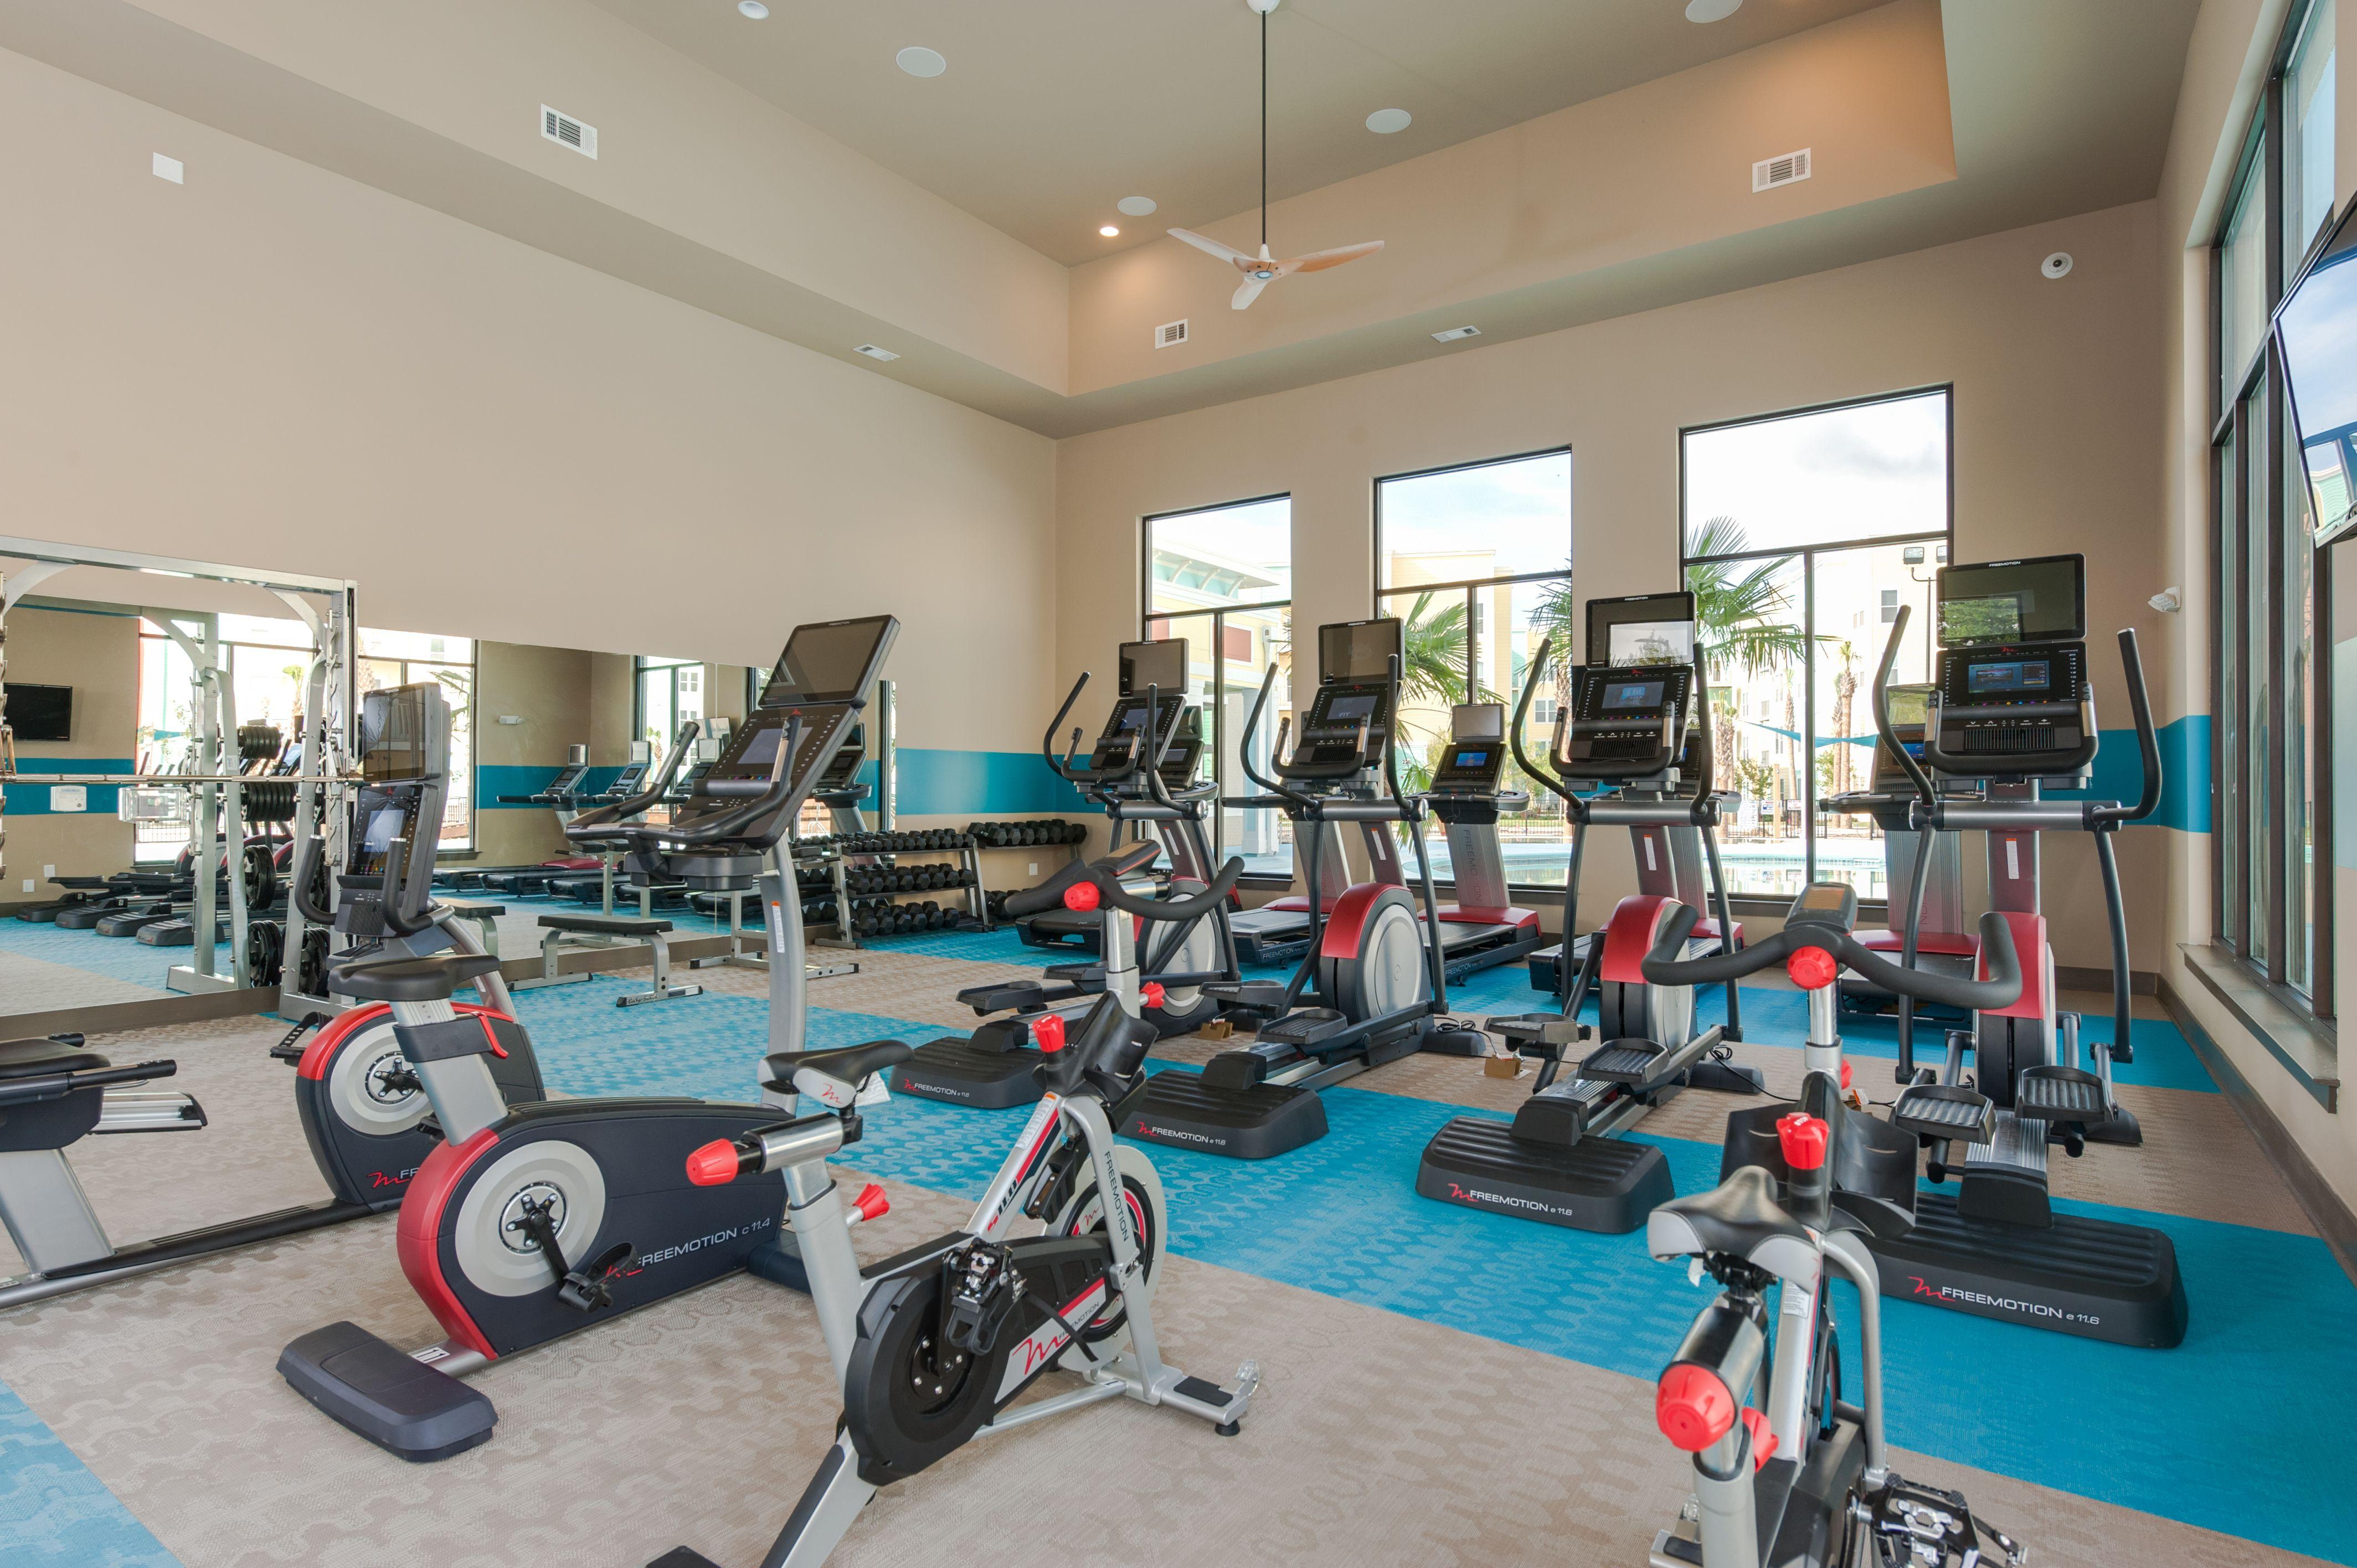 Newport Beach Interior Designers Multifamily 6 Jpg 4256 Fitness Centersnewport Beachdesigners